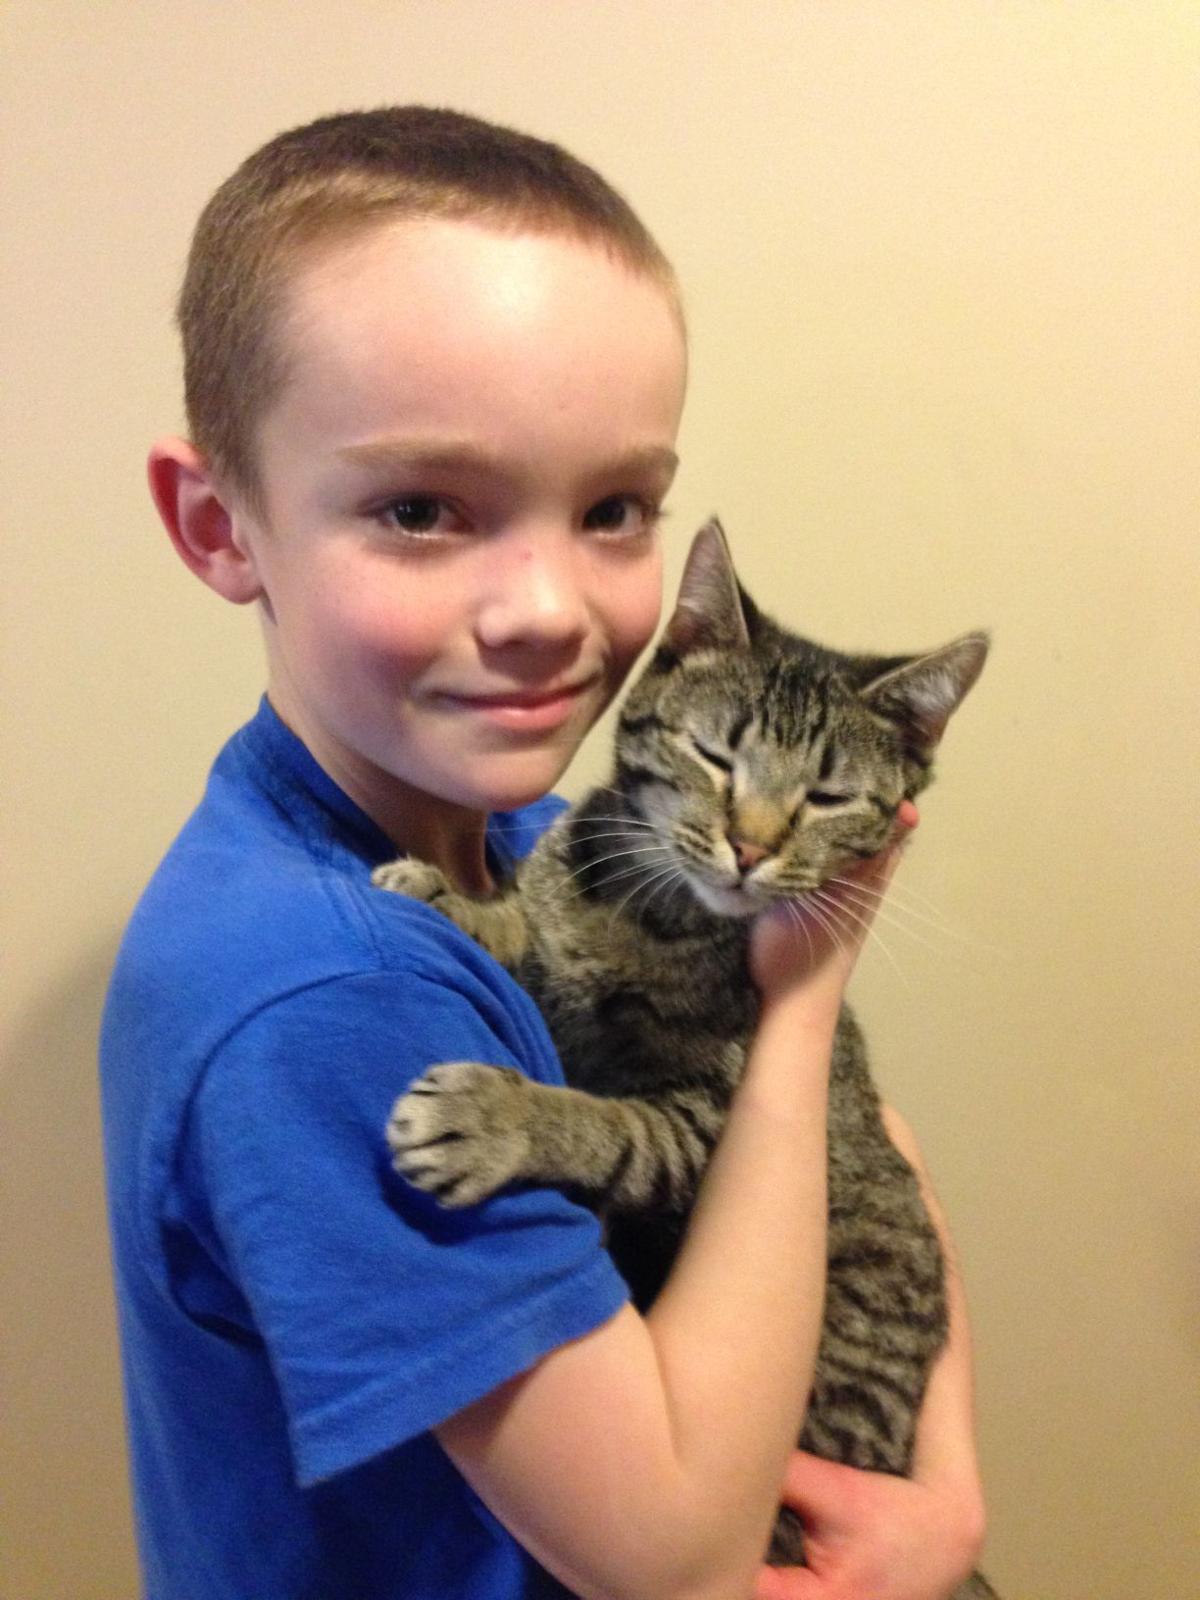 Jenni Dewitt's son and cat